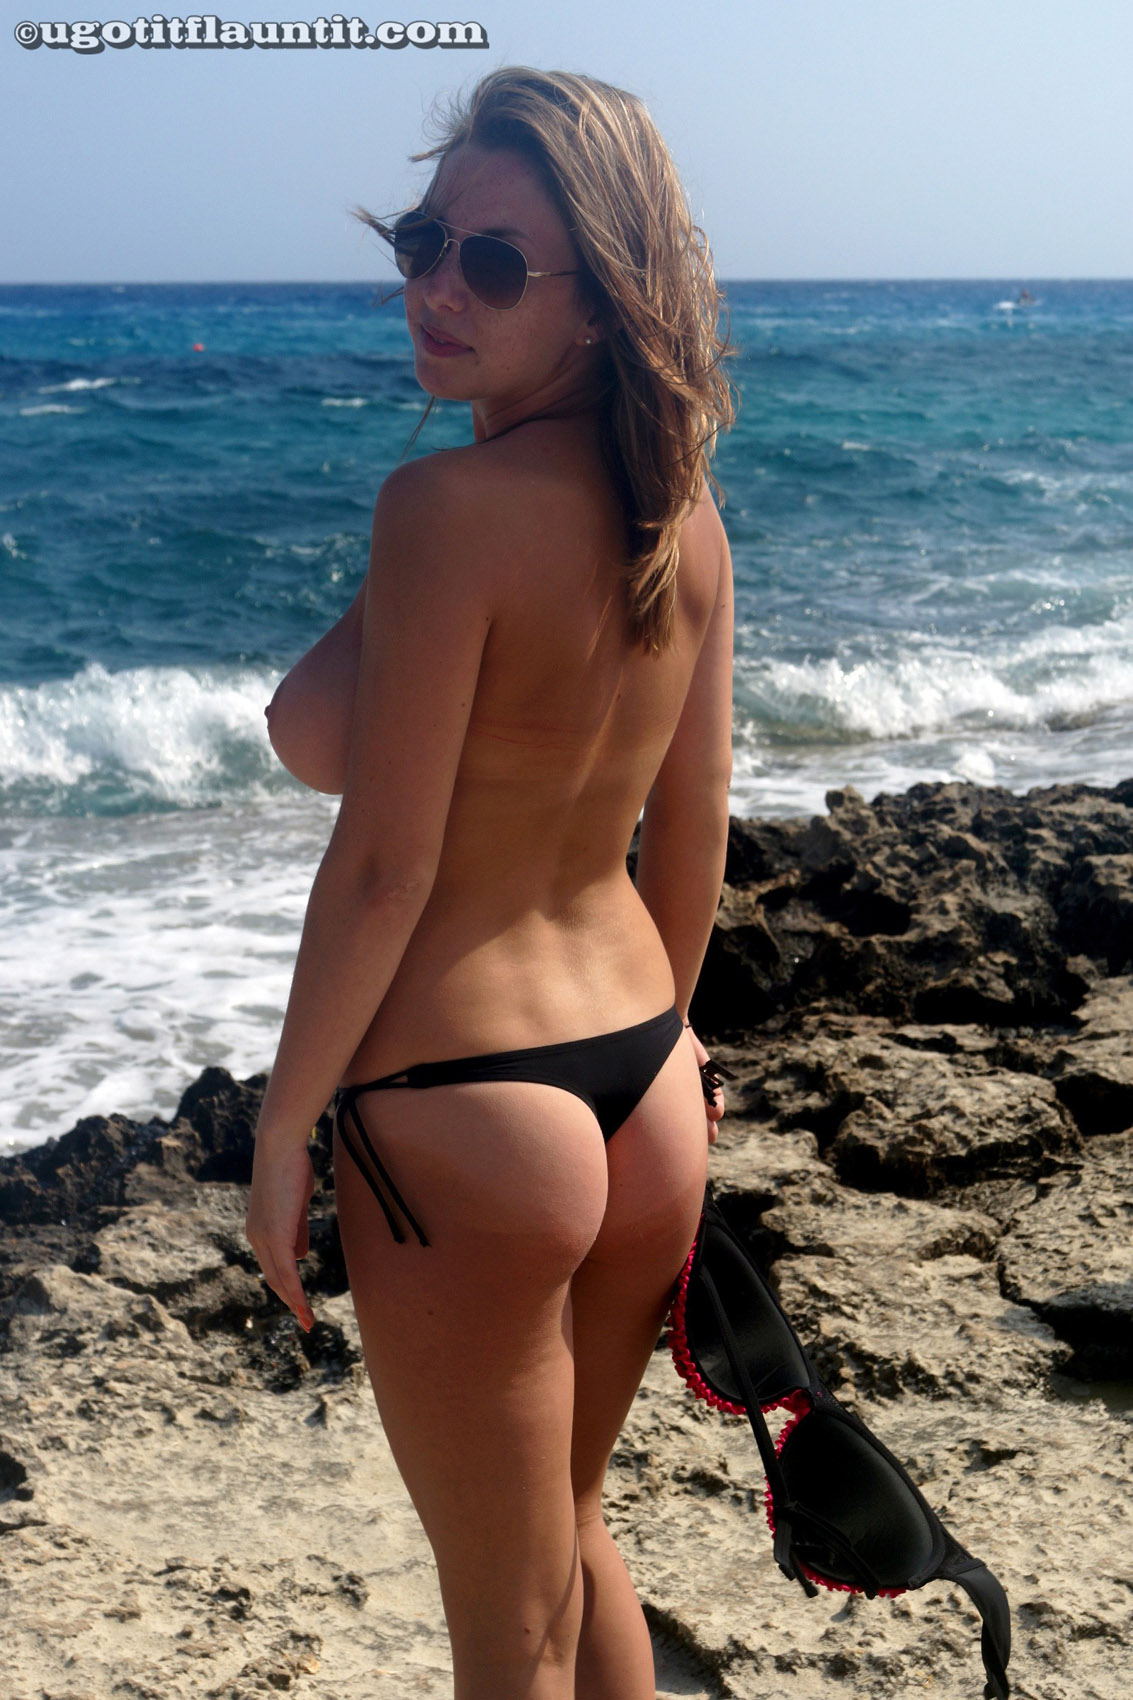 Babe beach busty find